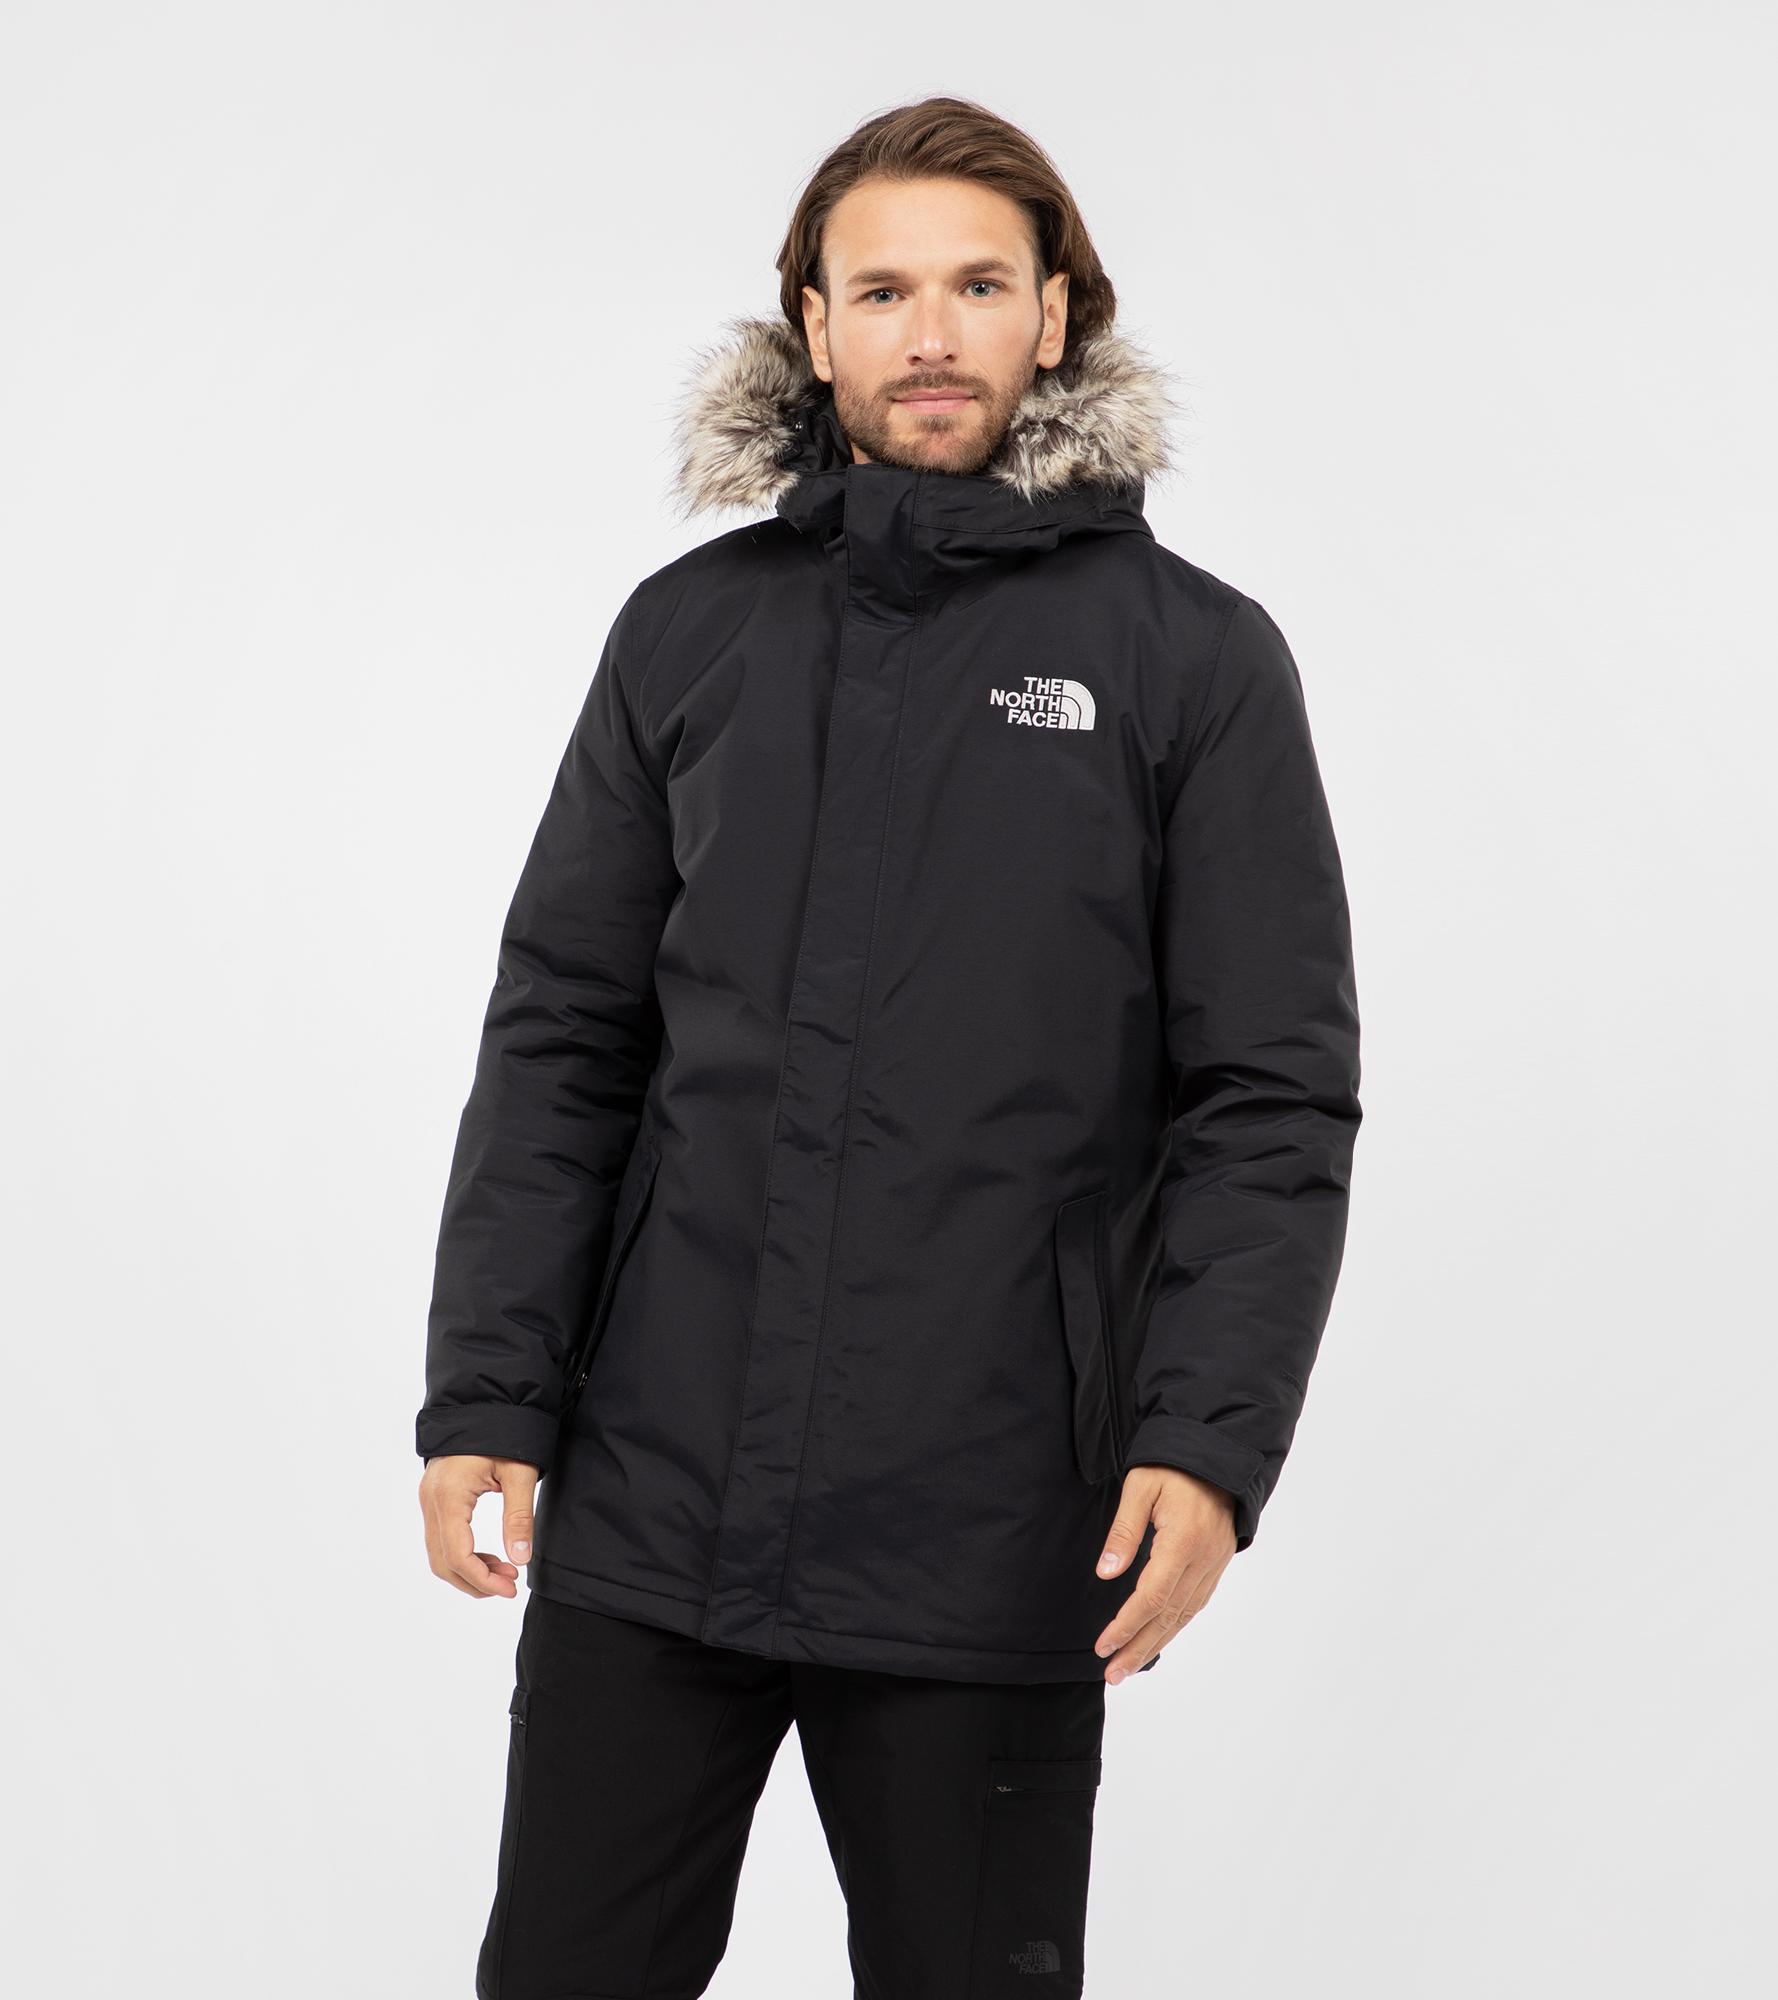 The North Face Куртка утепленная мужская The North Face Zaneck, размер 46